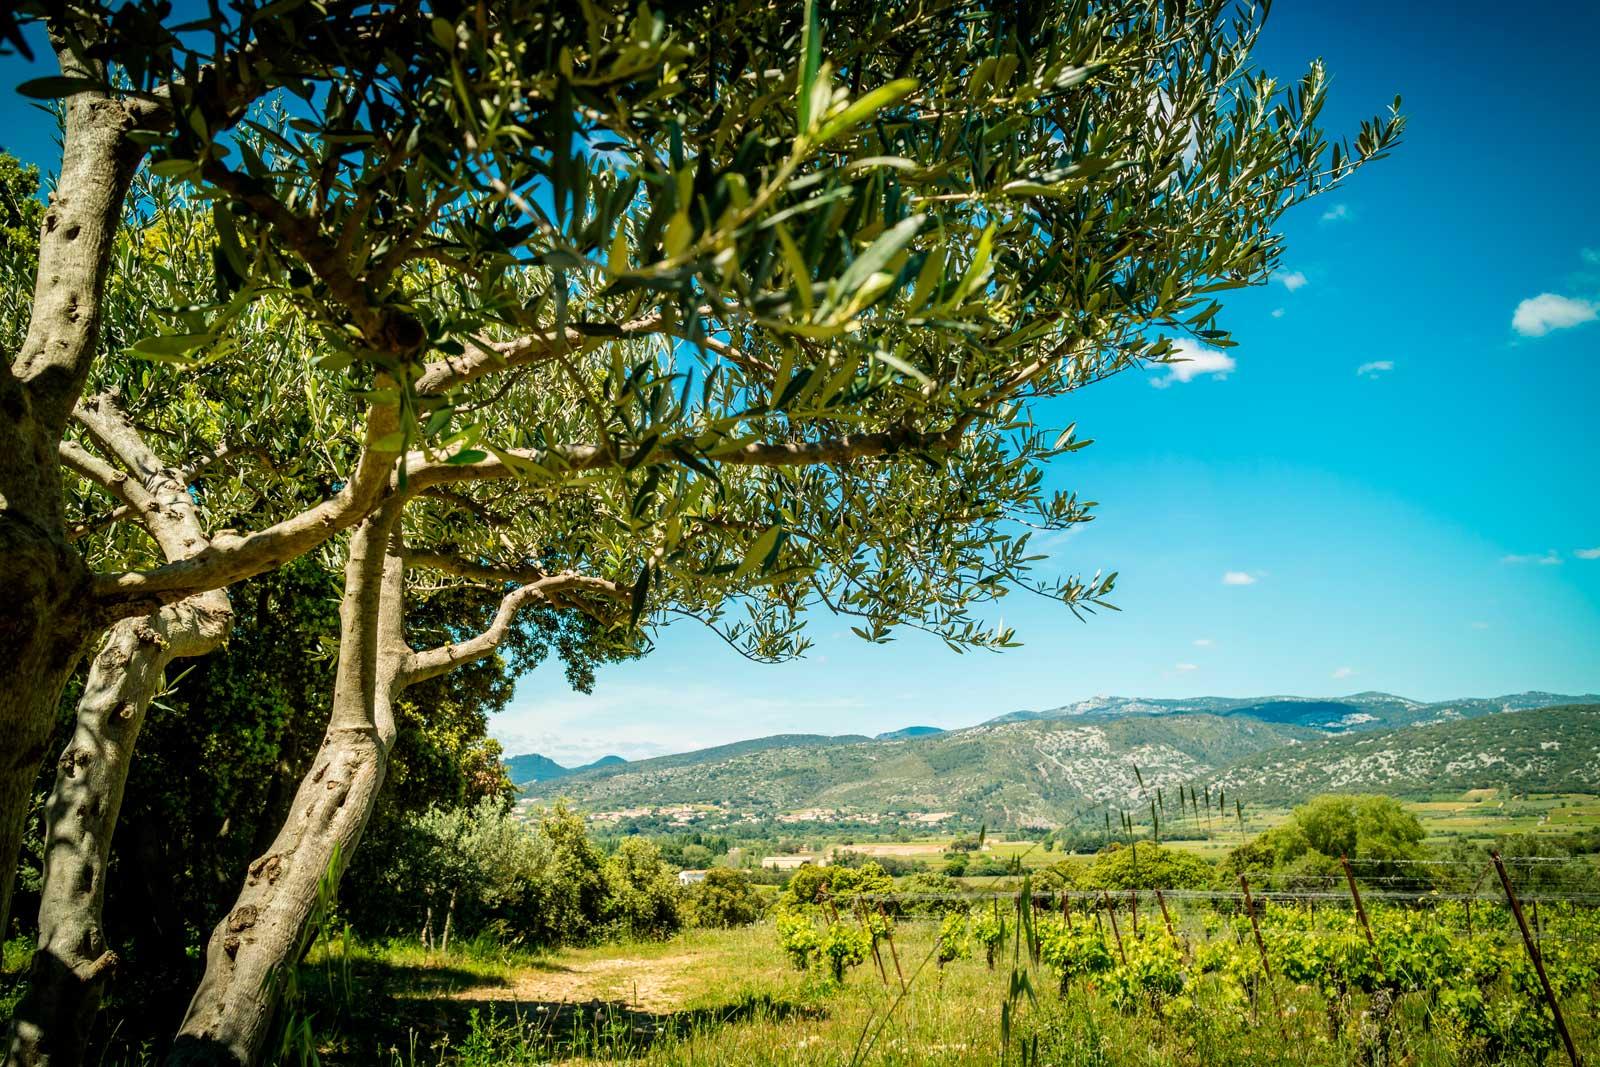 mas-seranne-vin-vente-domaine-degustation-caves-bio-languedoc_Venture_photo_Petiot_new6